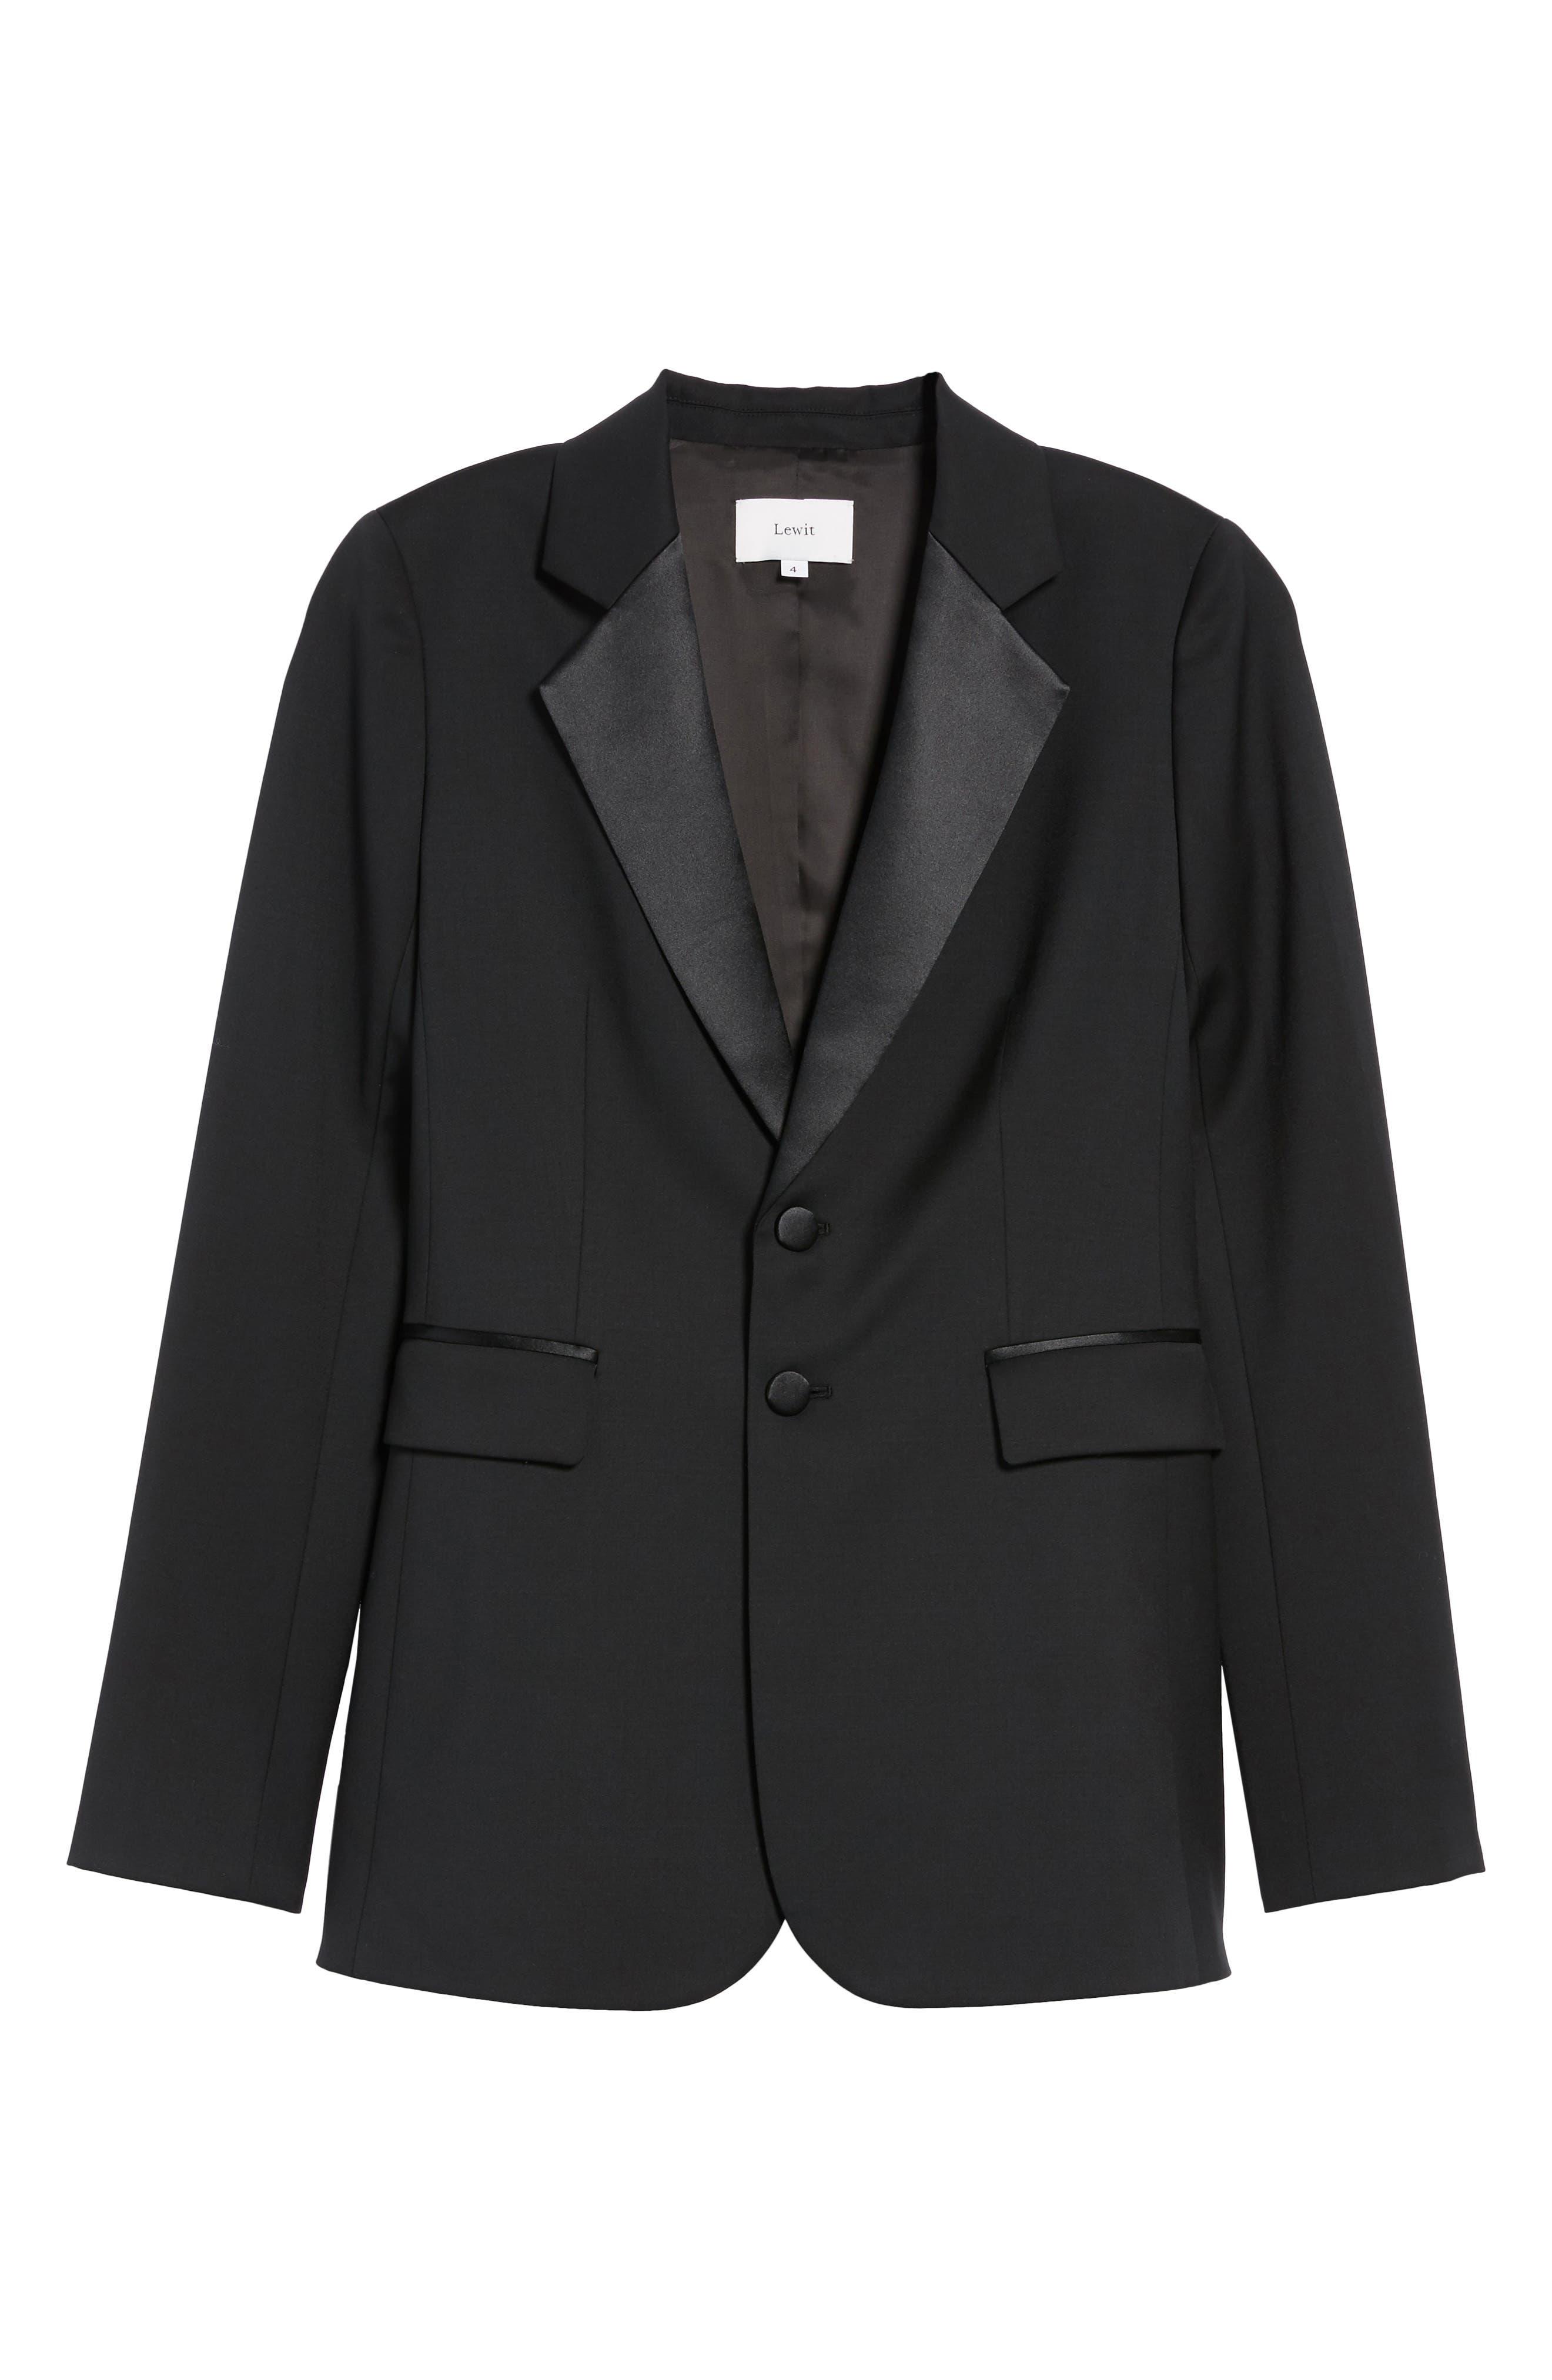 Tuxedo Detail Wool Suit Jacket,                             Alternate thumbnail 7, color,                             Black